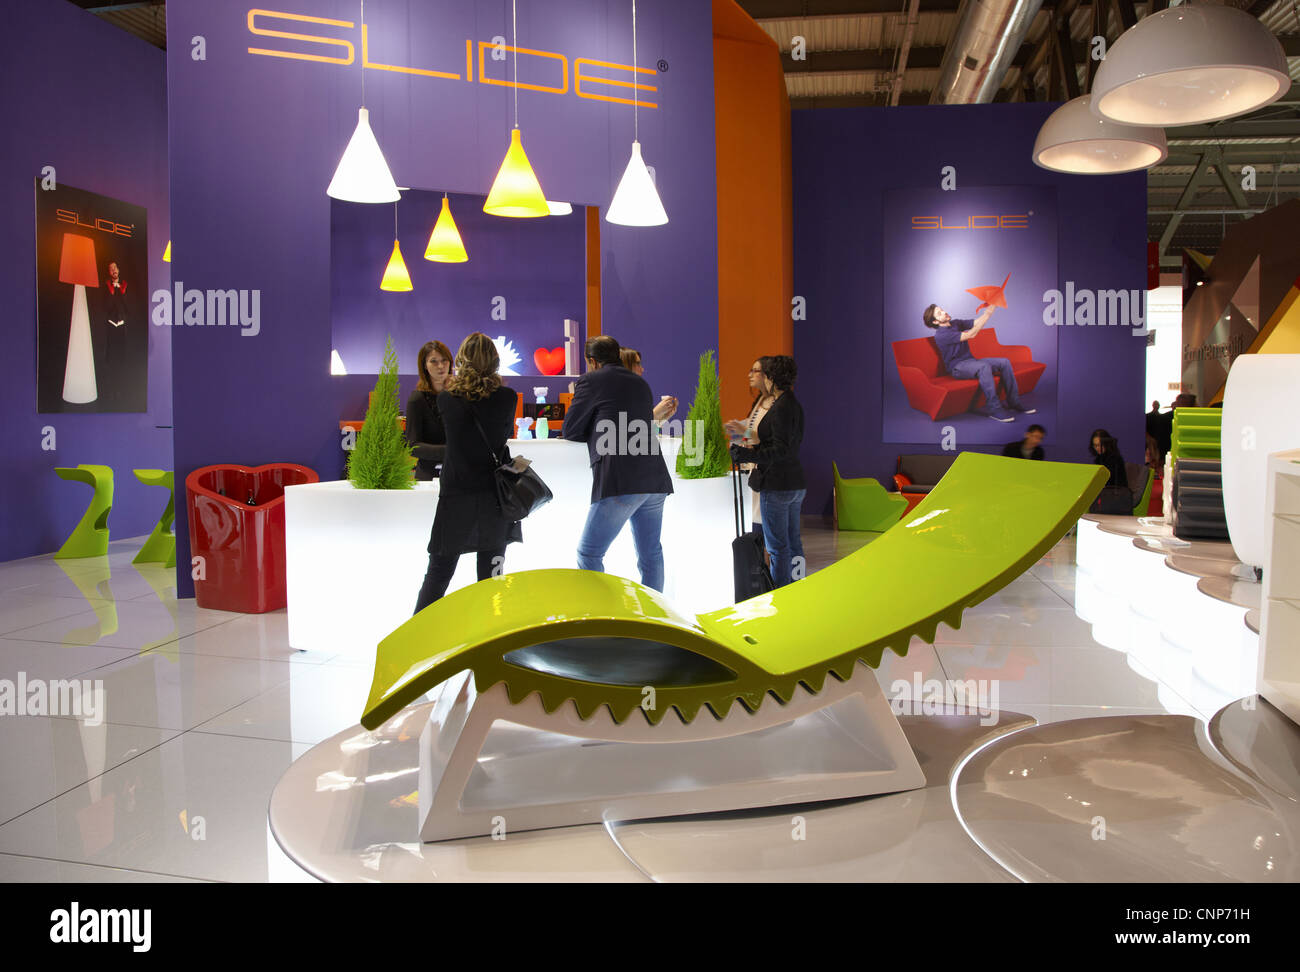 MILAN - ITALY - APRIL 2012: Salone internazionale del mobile 2012, furniture fair, Slide - Stock Image